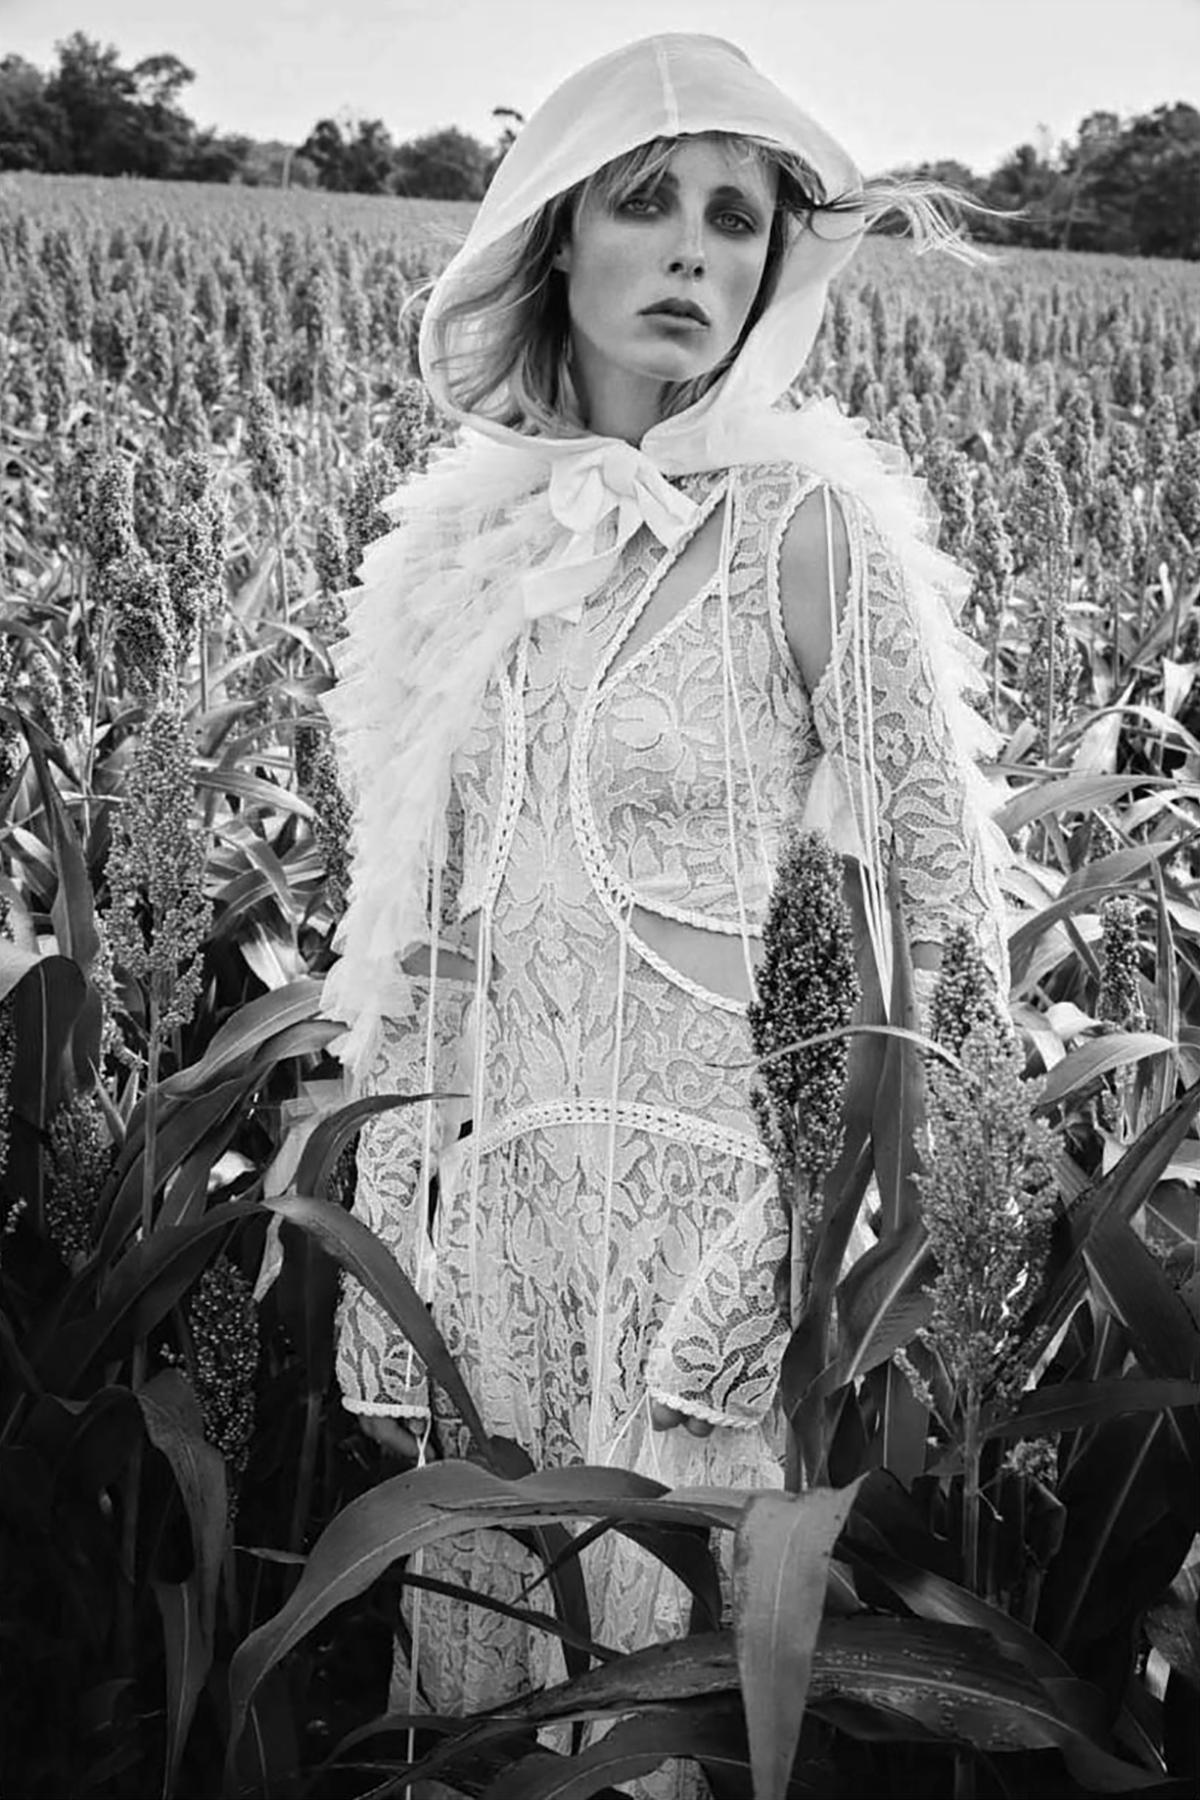 Edie-Campbell-Patrick-Demarchelier-Vogue-China-Dec-2017- (4).jpg